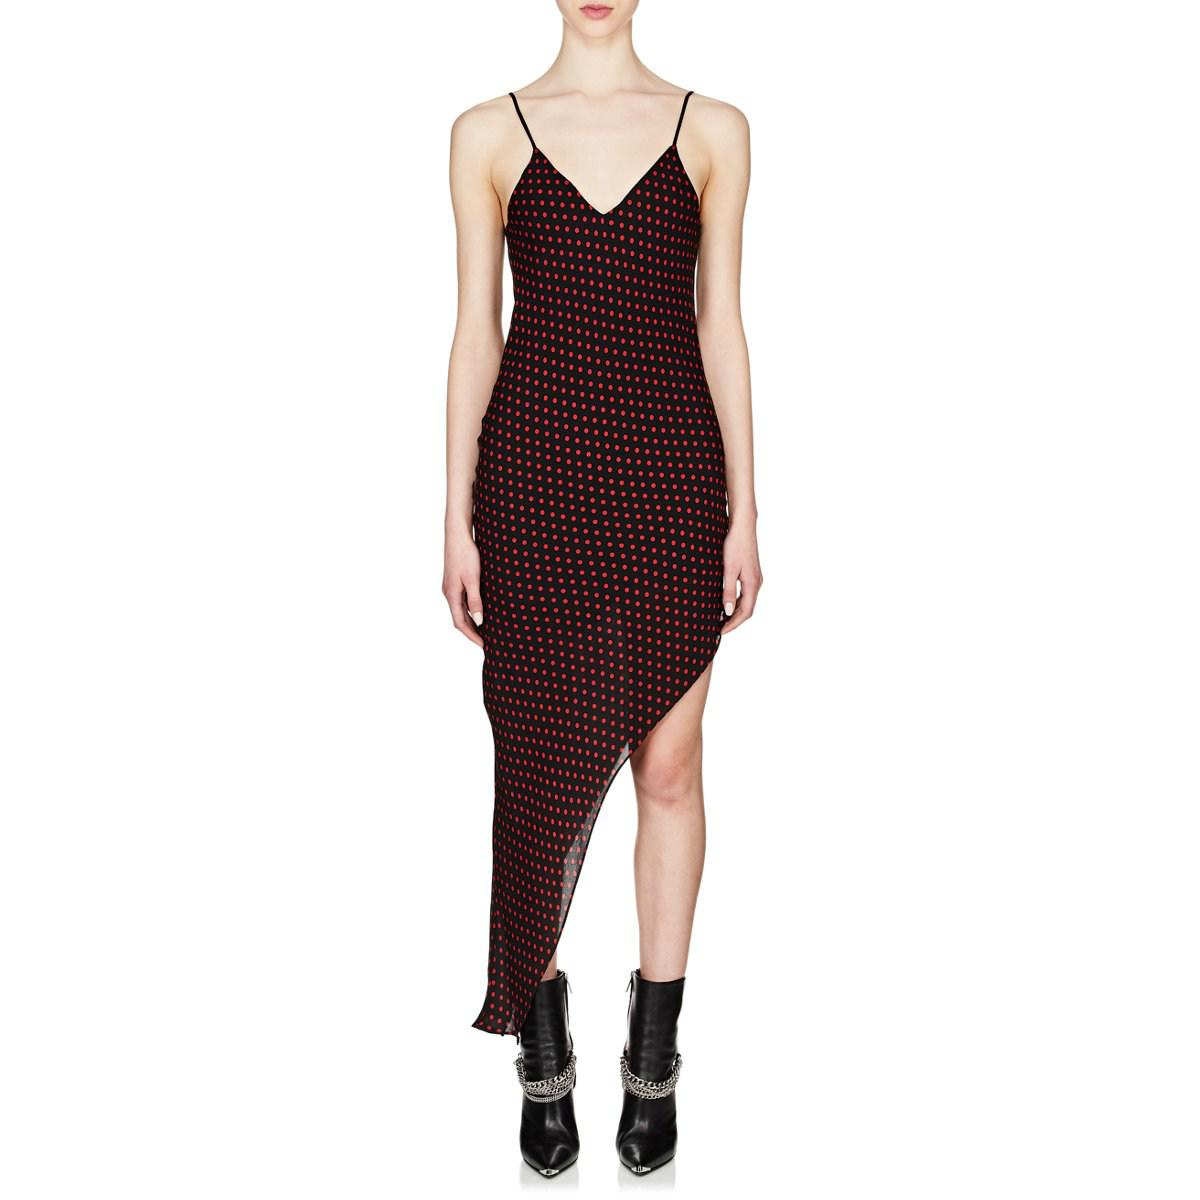 a89197f9716a2 Amiri Polka Dot Silk Satin Slipdress in Black - Lyst